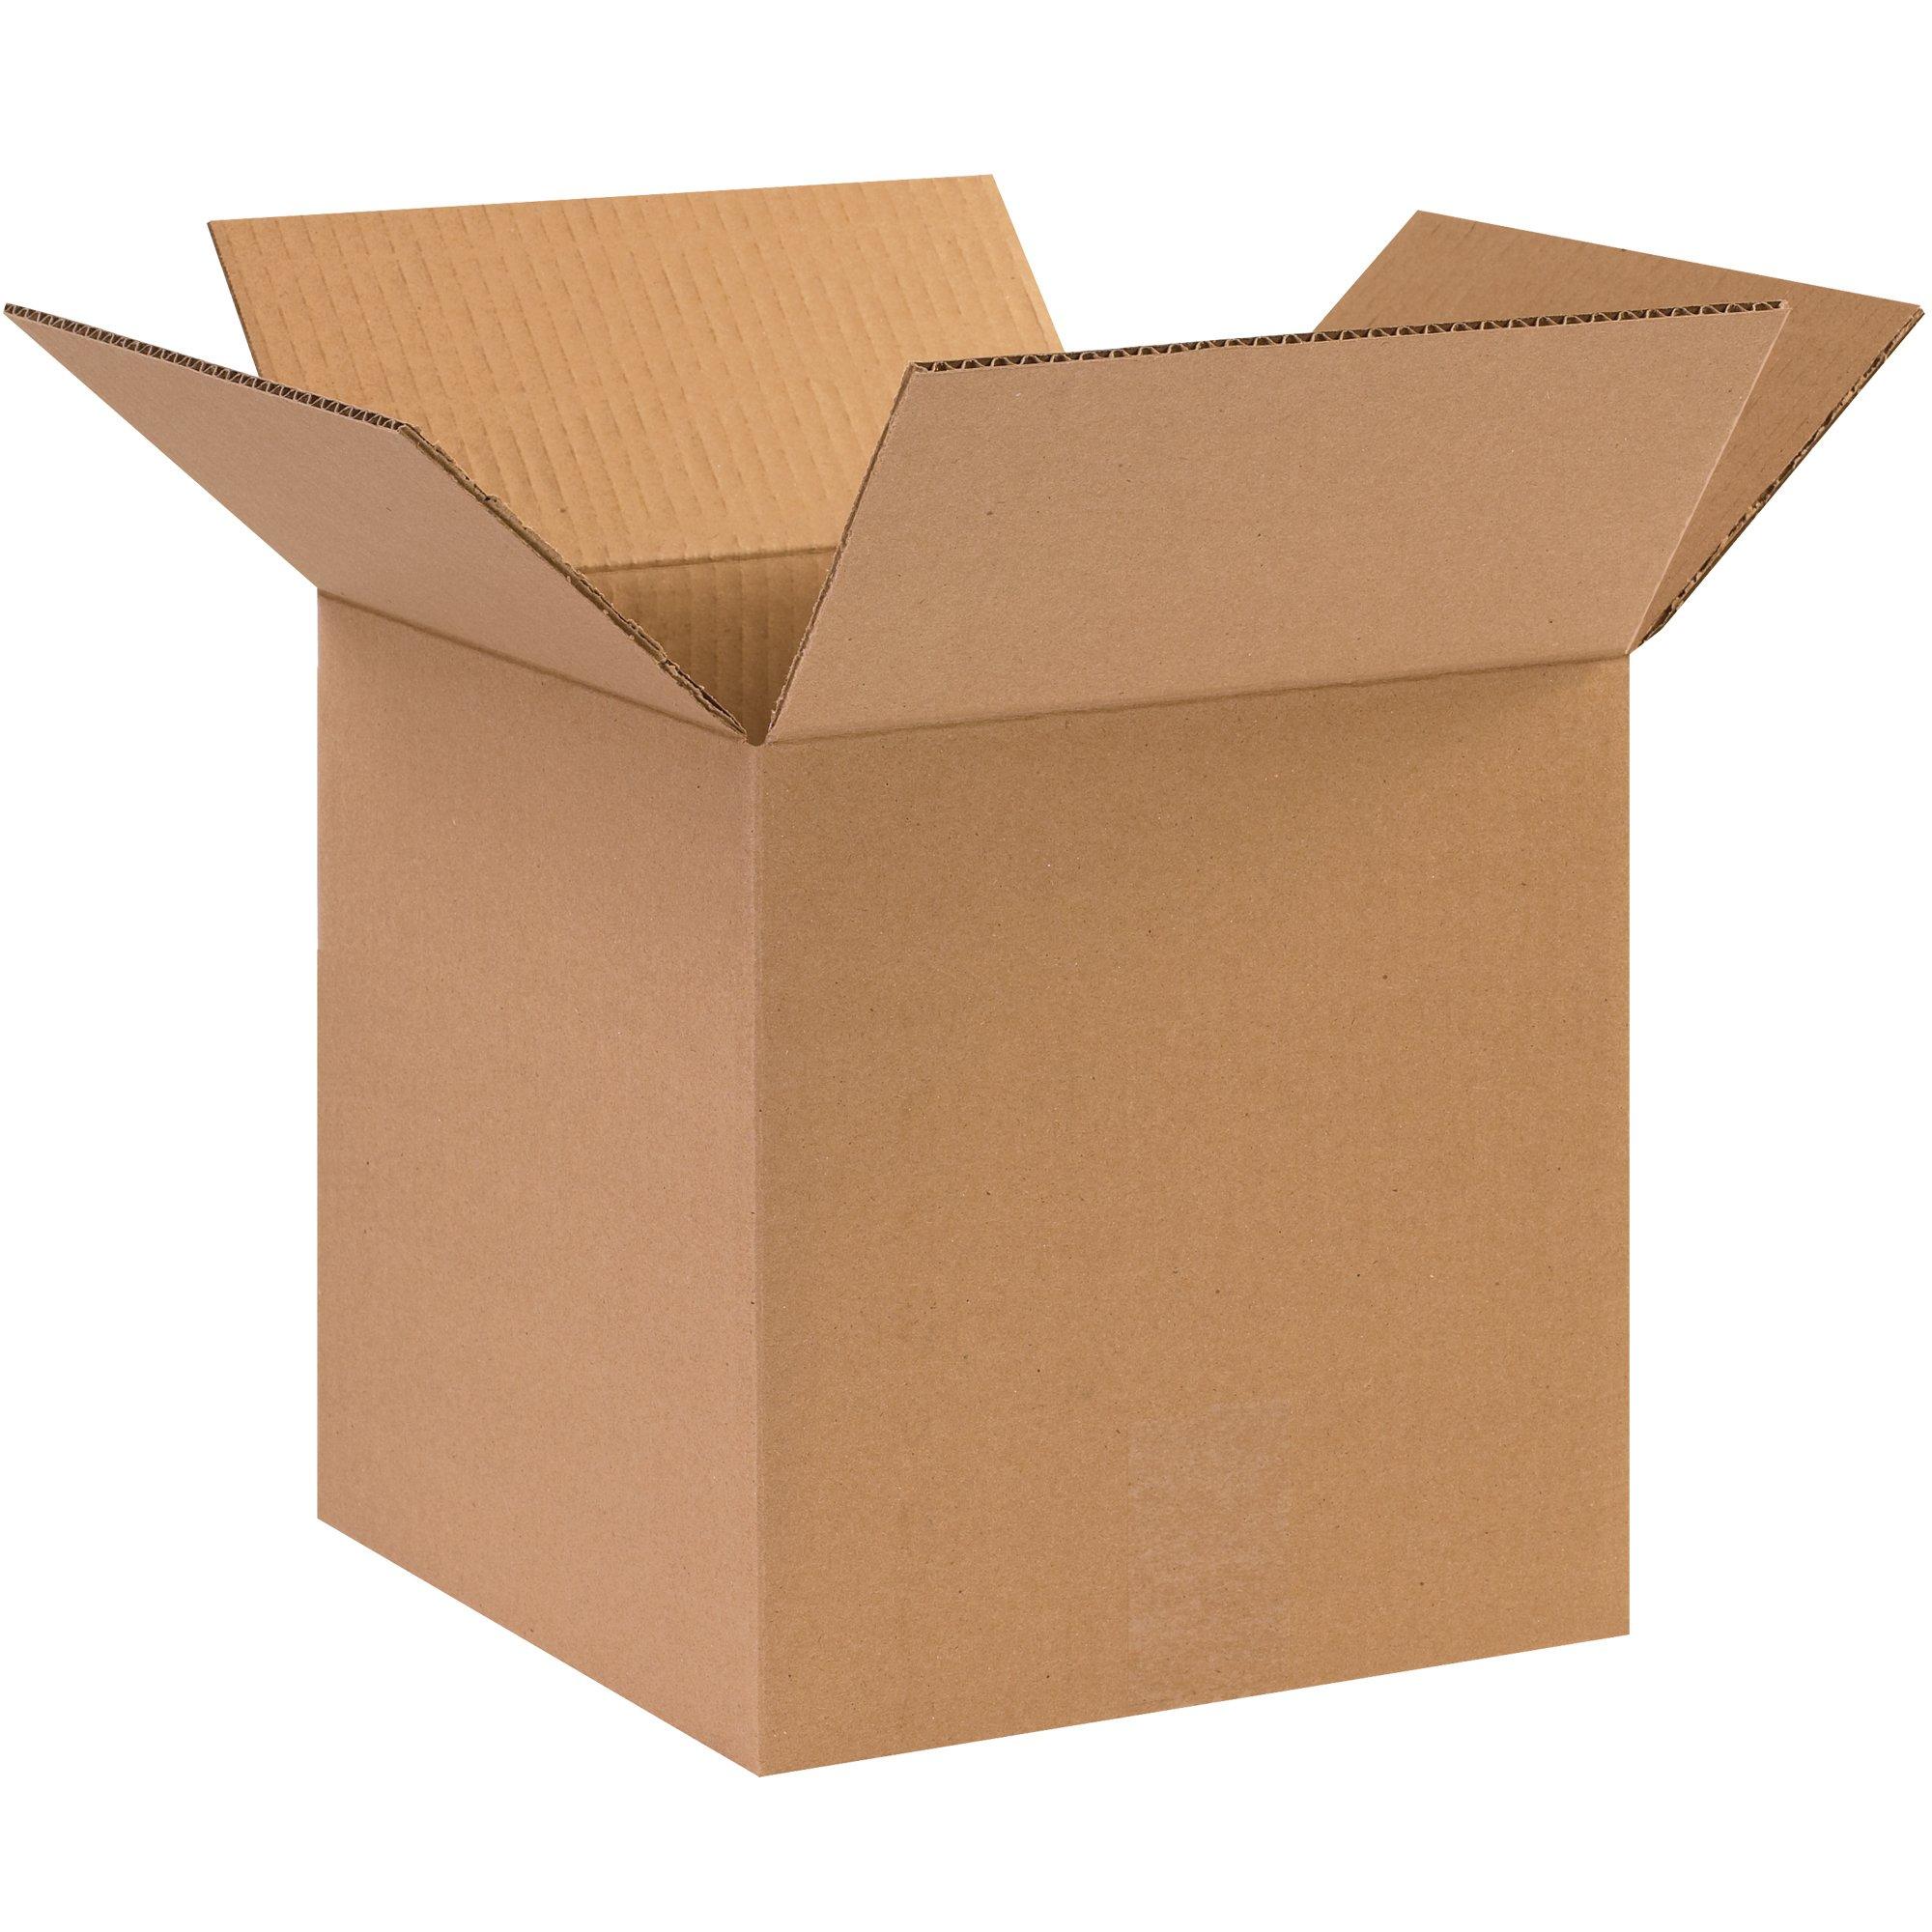 BOX USA B1010101000PK Corrugated Boxes, 10''L x 10''W x 10''H, Kraft (Pack of 1000)